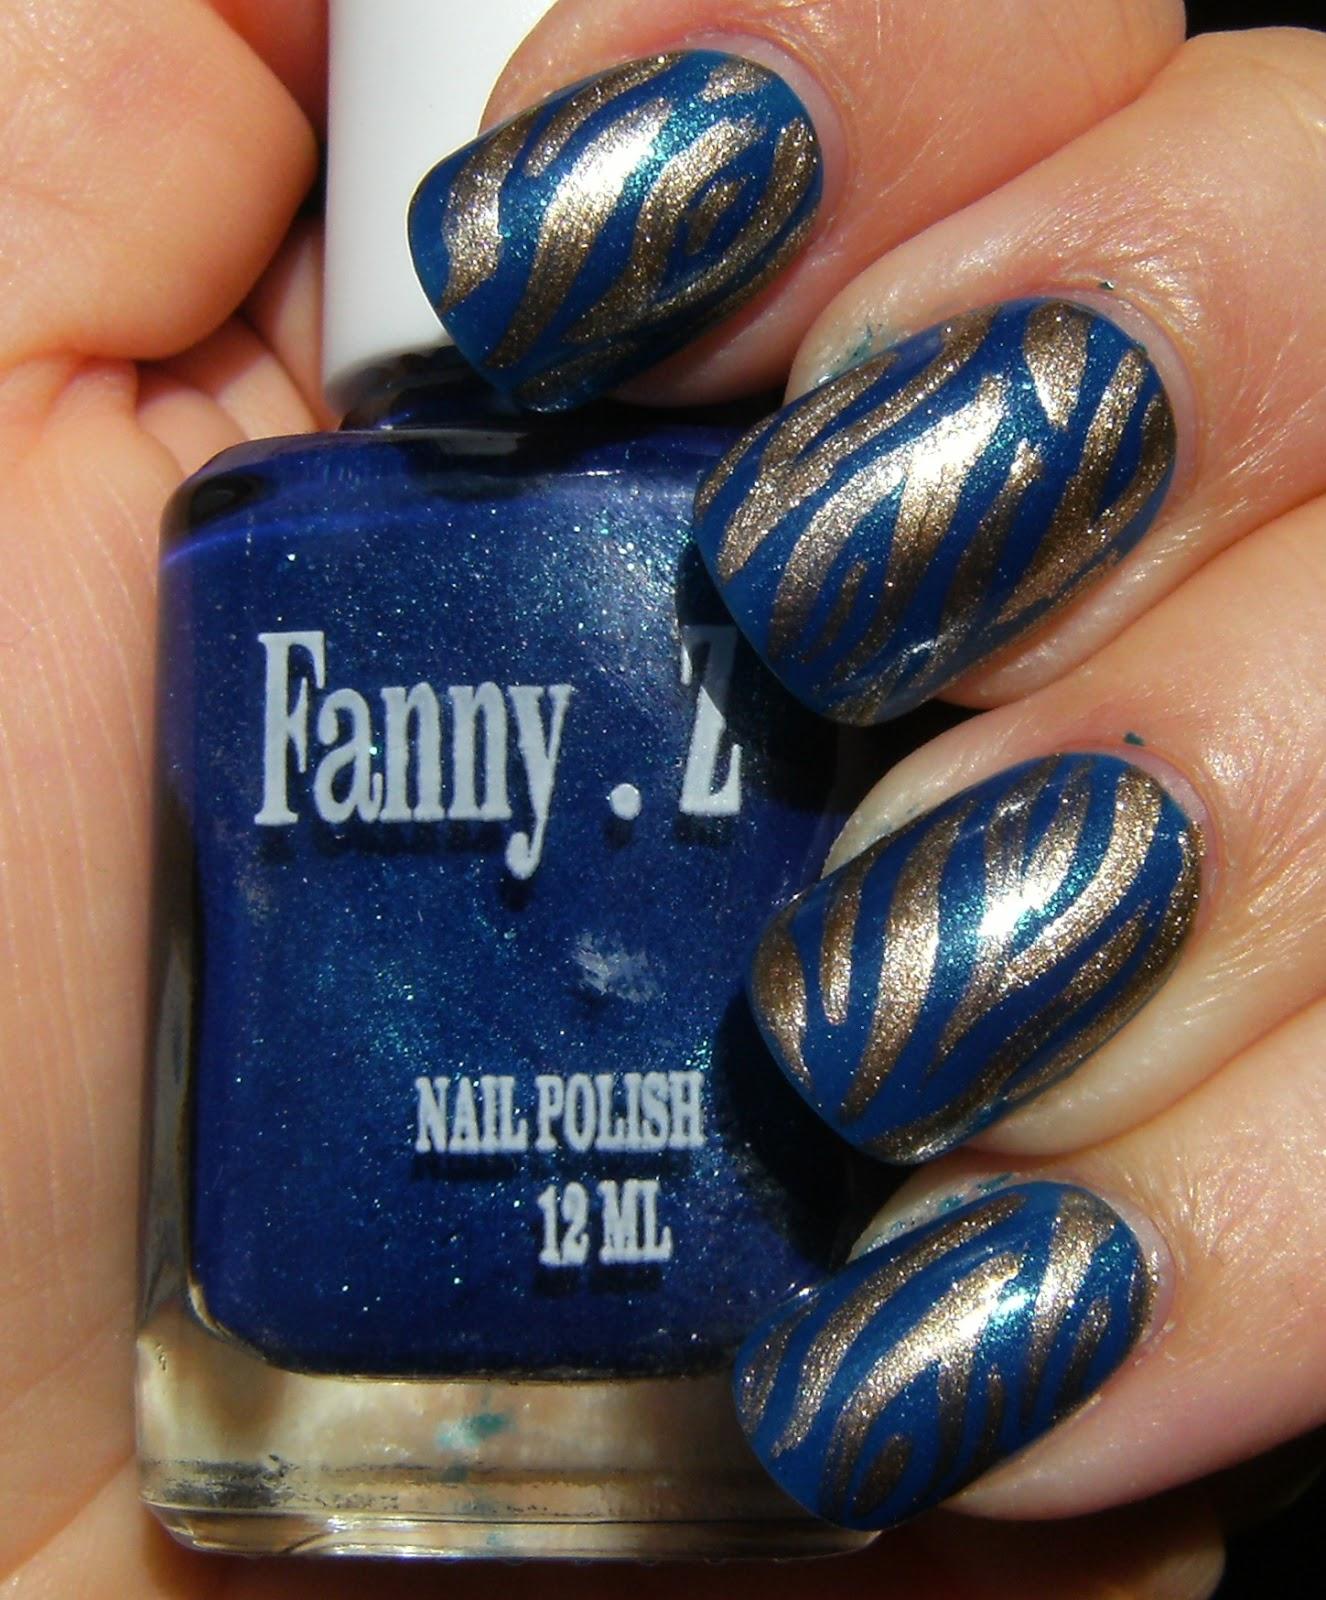 http://1.bp.blogspot.com/-0vjd5_17wso/UVN-hmflc1I/AAAAAAAAc-I/l3pXT9BCEcA/s1600/fanny+Z+%27whoa%27+with+gold+zebra+stripes+---DEEZ-NAILZ---+(10).JPG